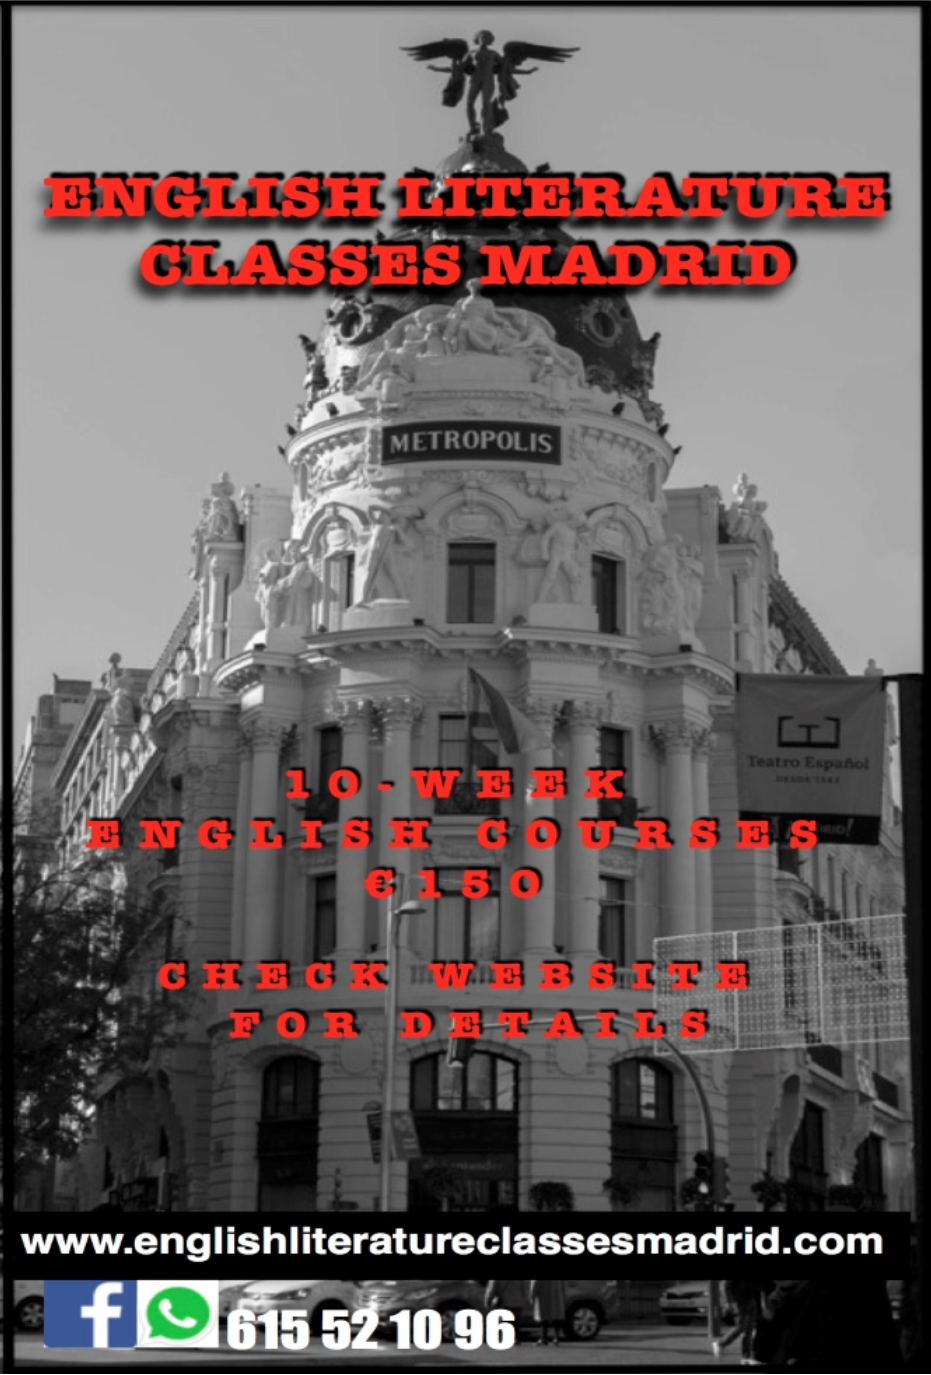 English Literature Classes Madrid